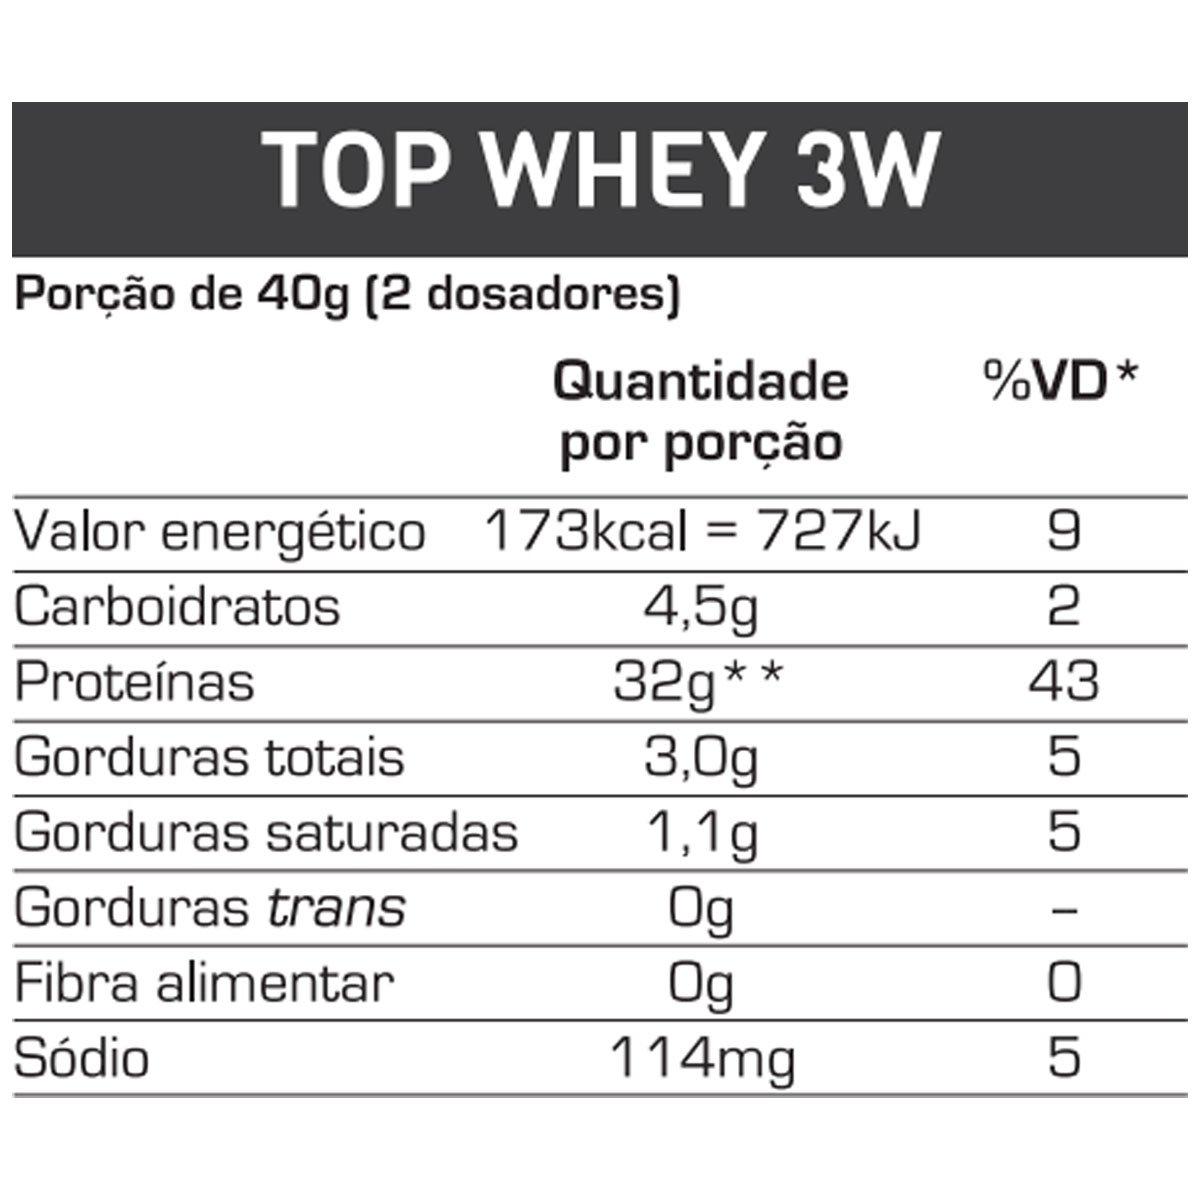 TopWay Suplementos - Top Whey 3w 1800g - Max Titanium - Tabela Nutricional